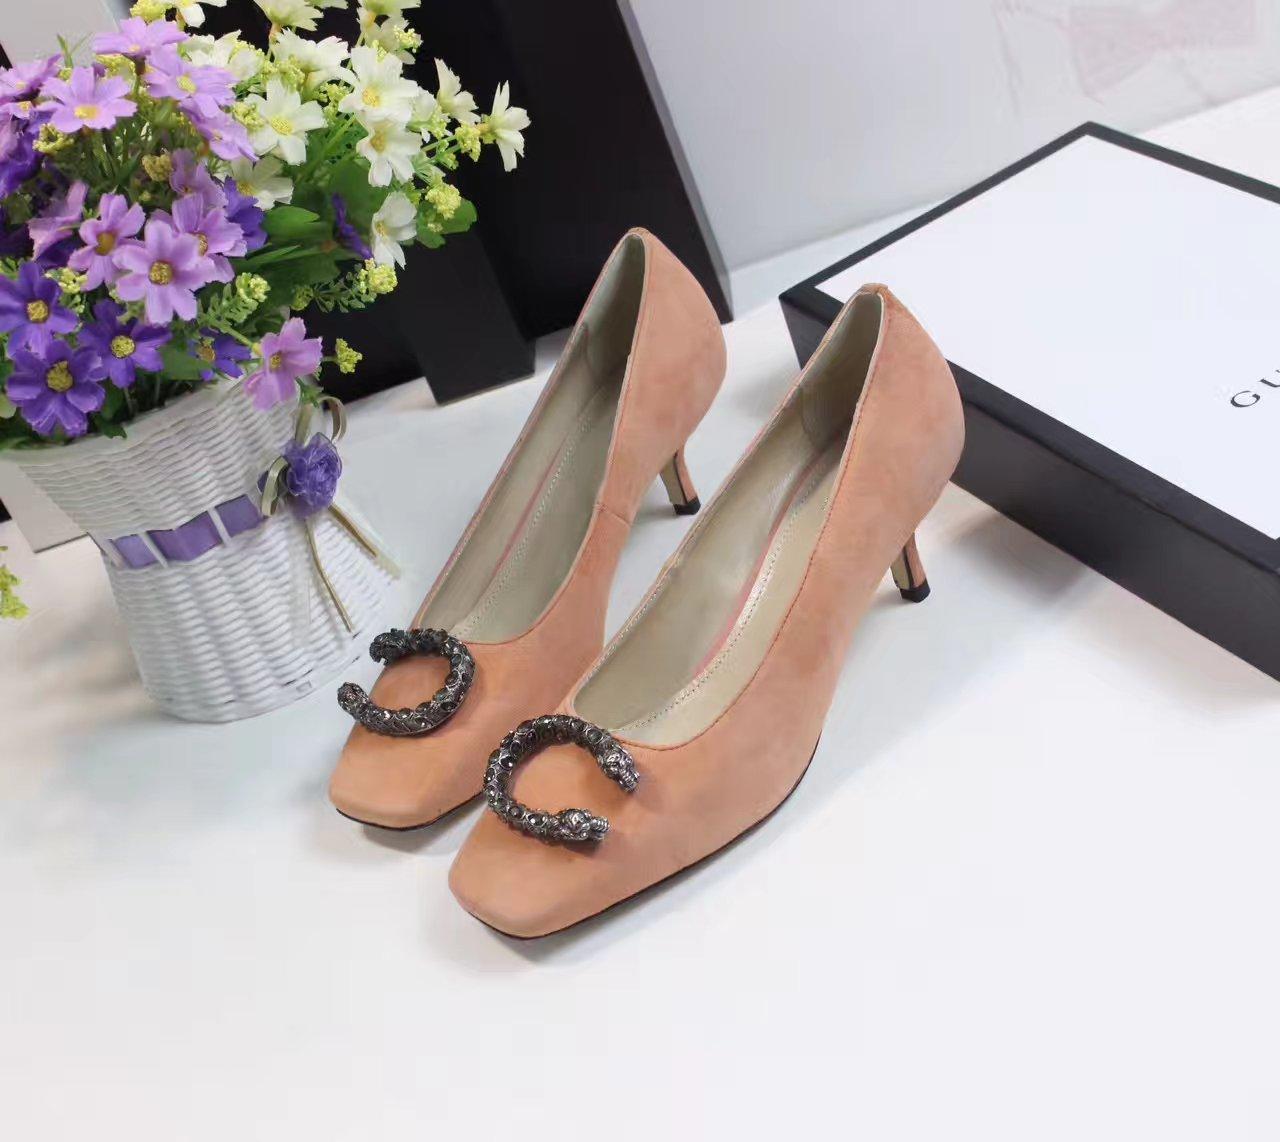 GUCCI女鞋_【古奇单鞋】原单高档鞋子代理一件代发